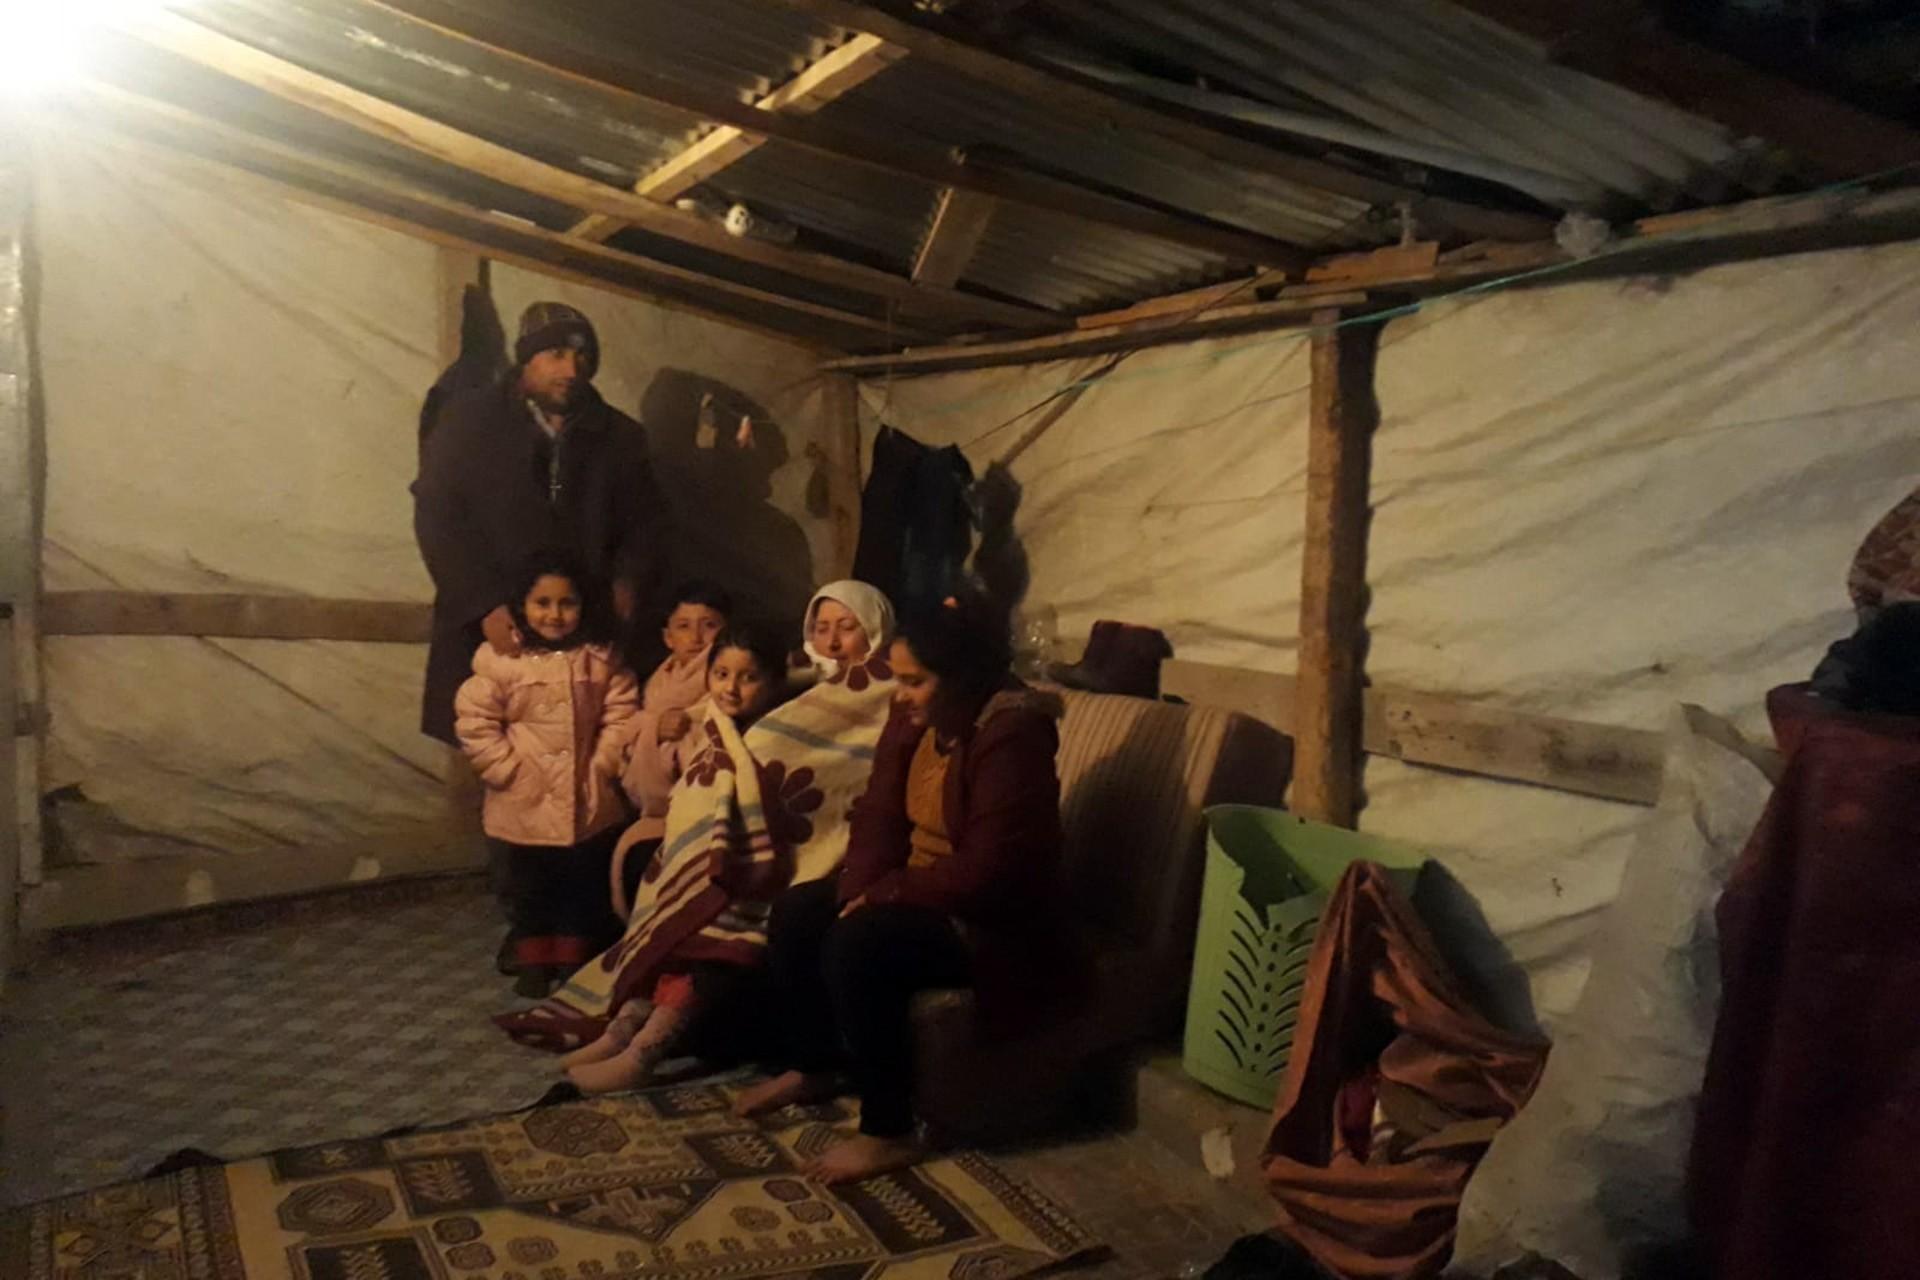 Naylon çadırda yaşayan aile